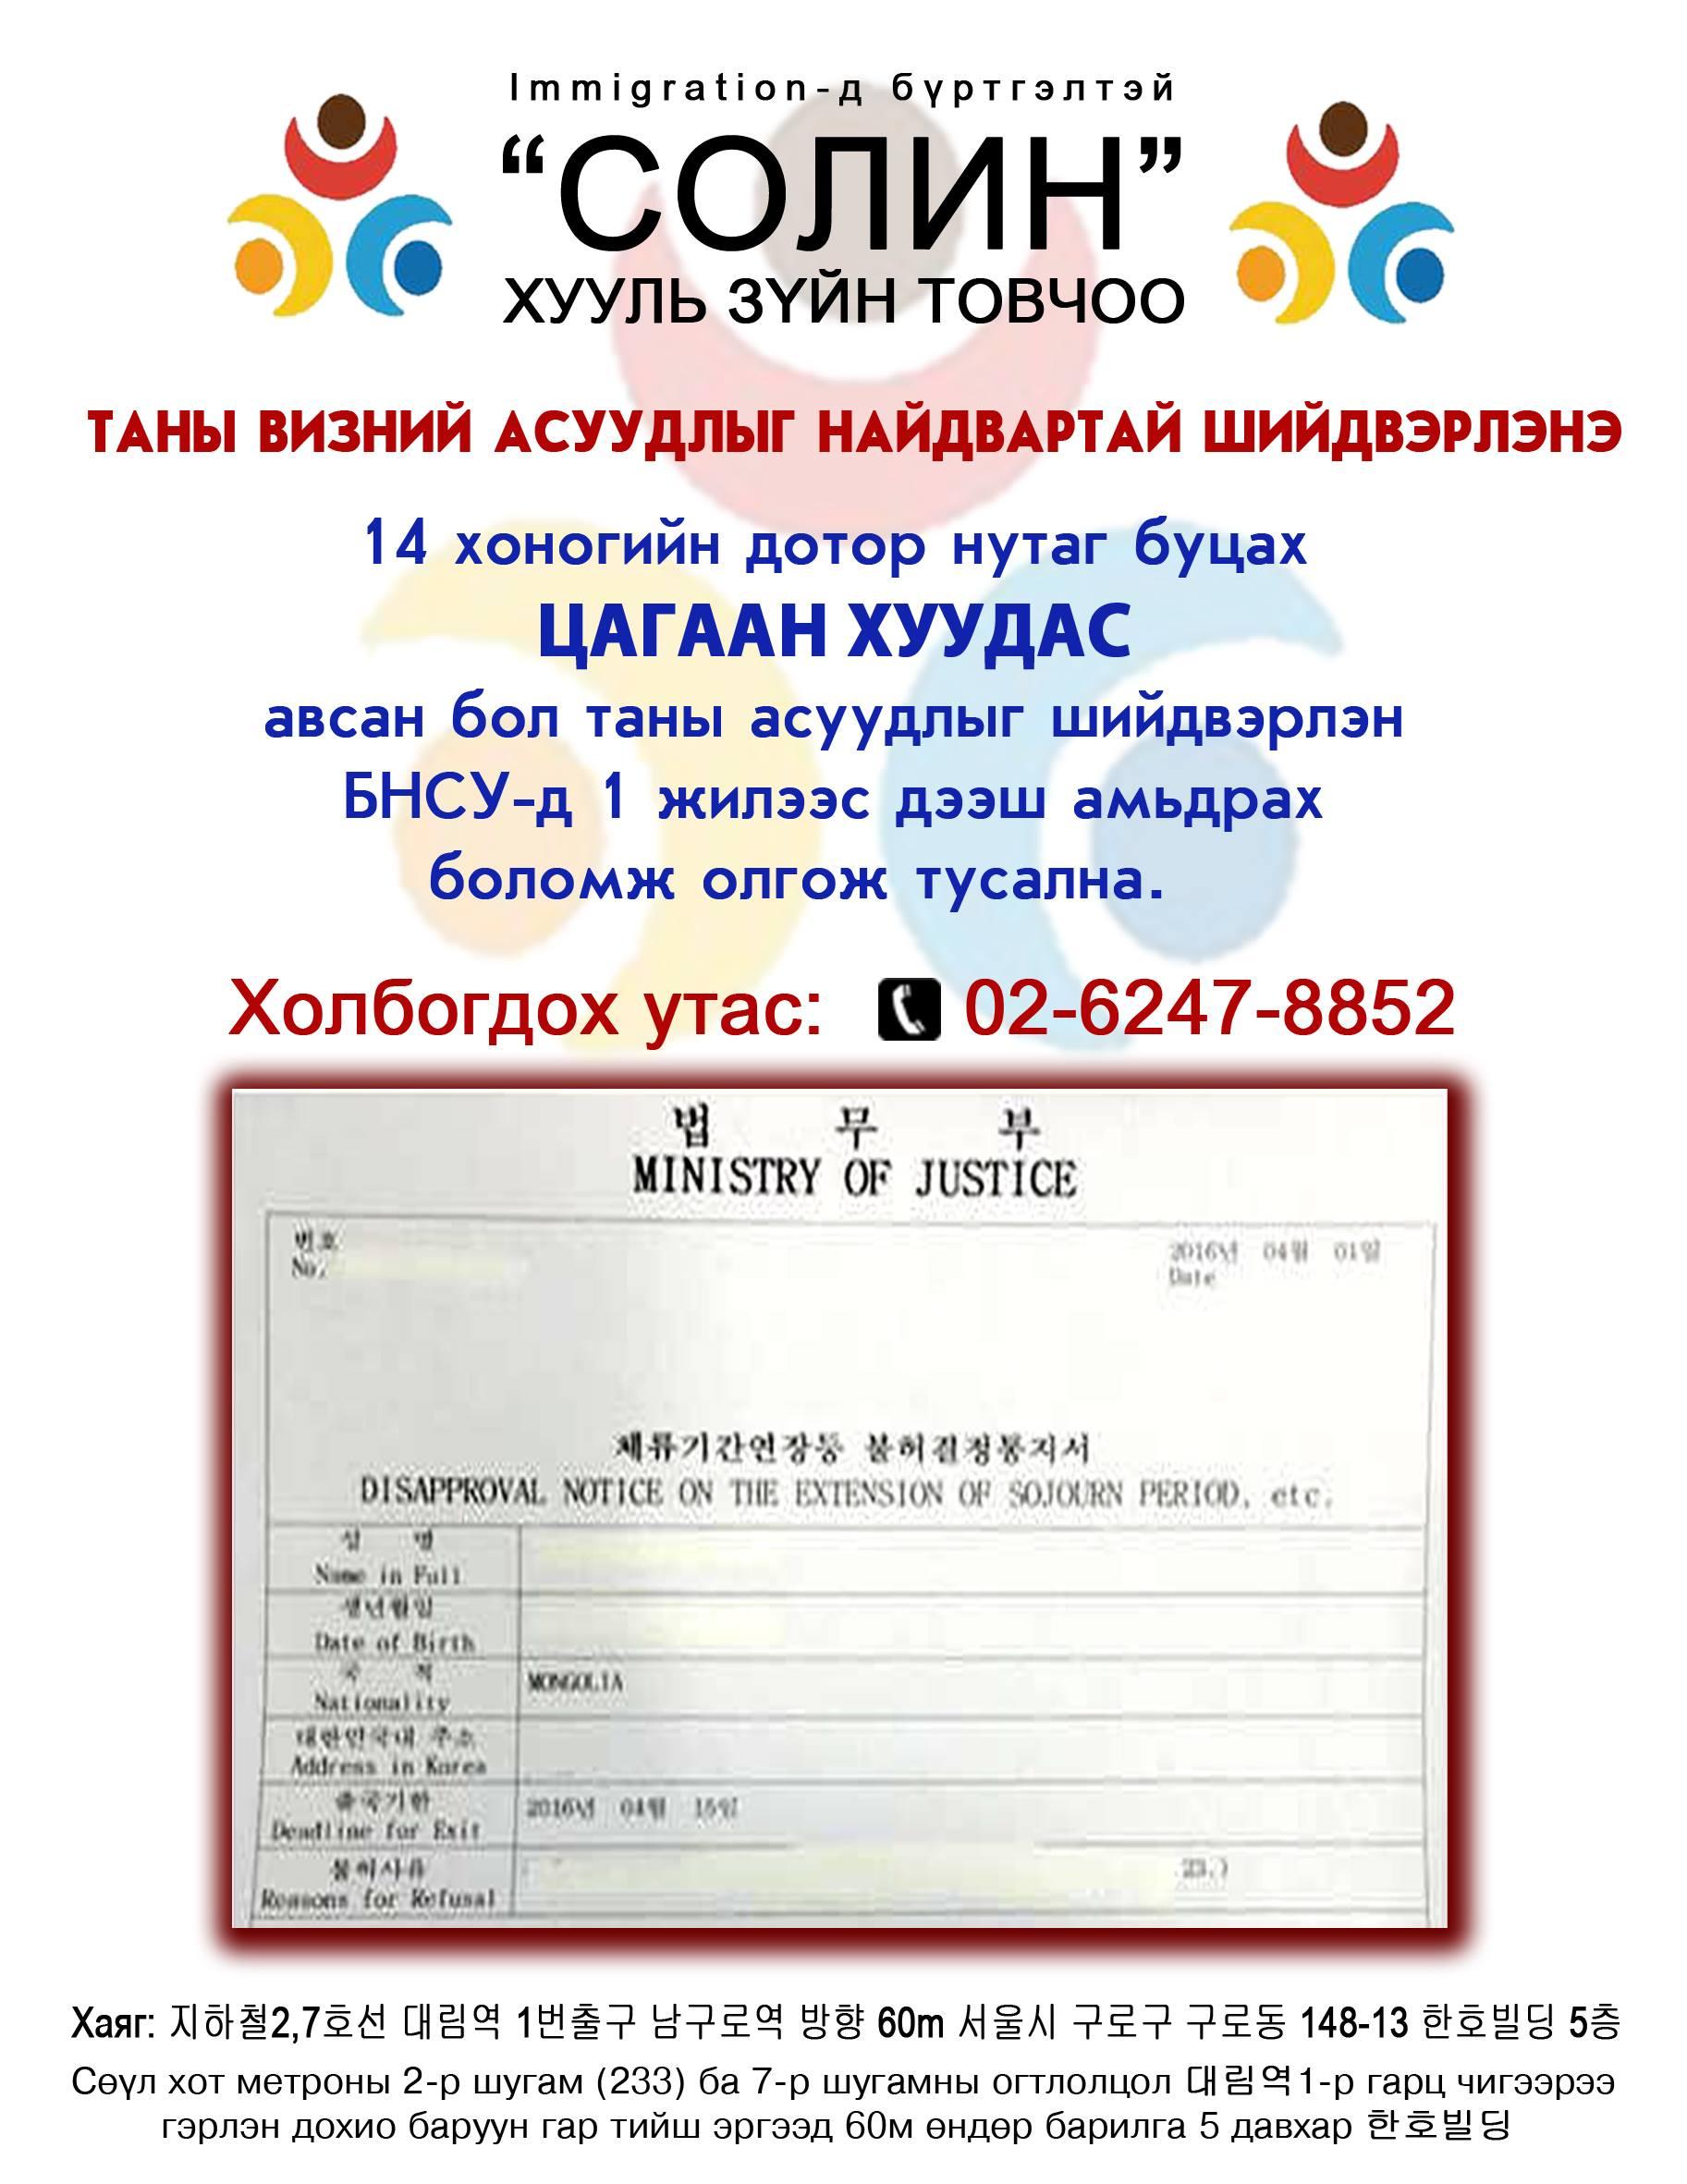 29790794_1837519733208726_2866445071518007296_o.jpg